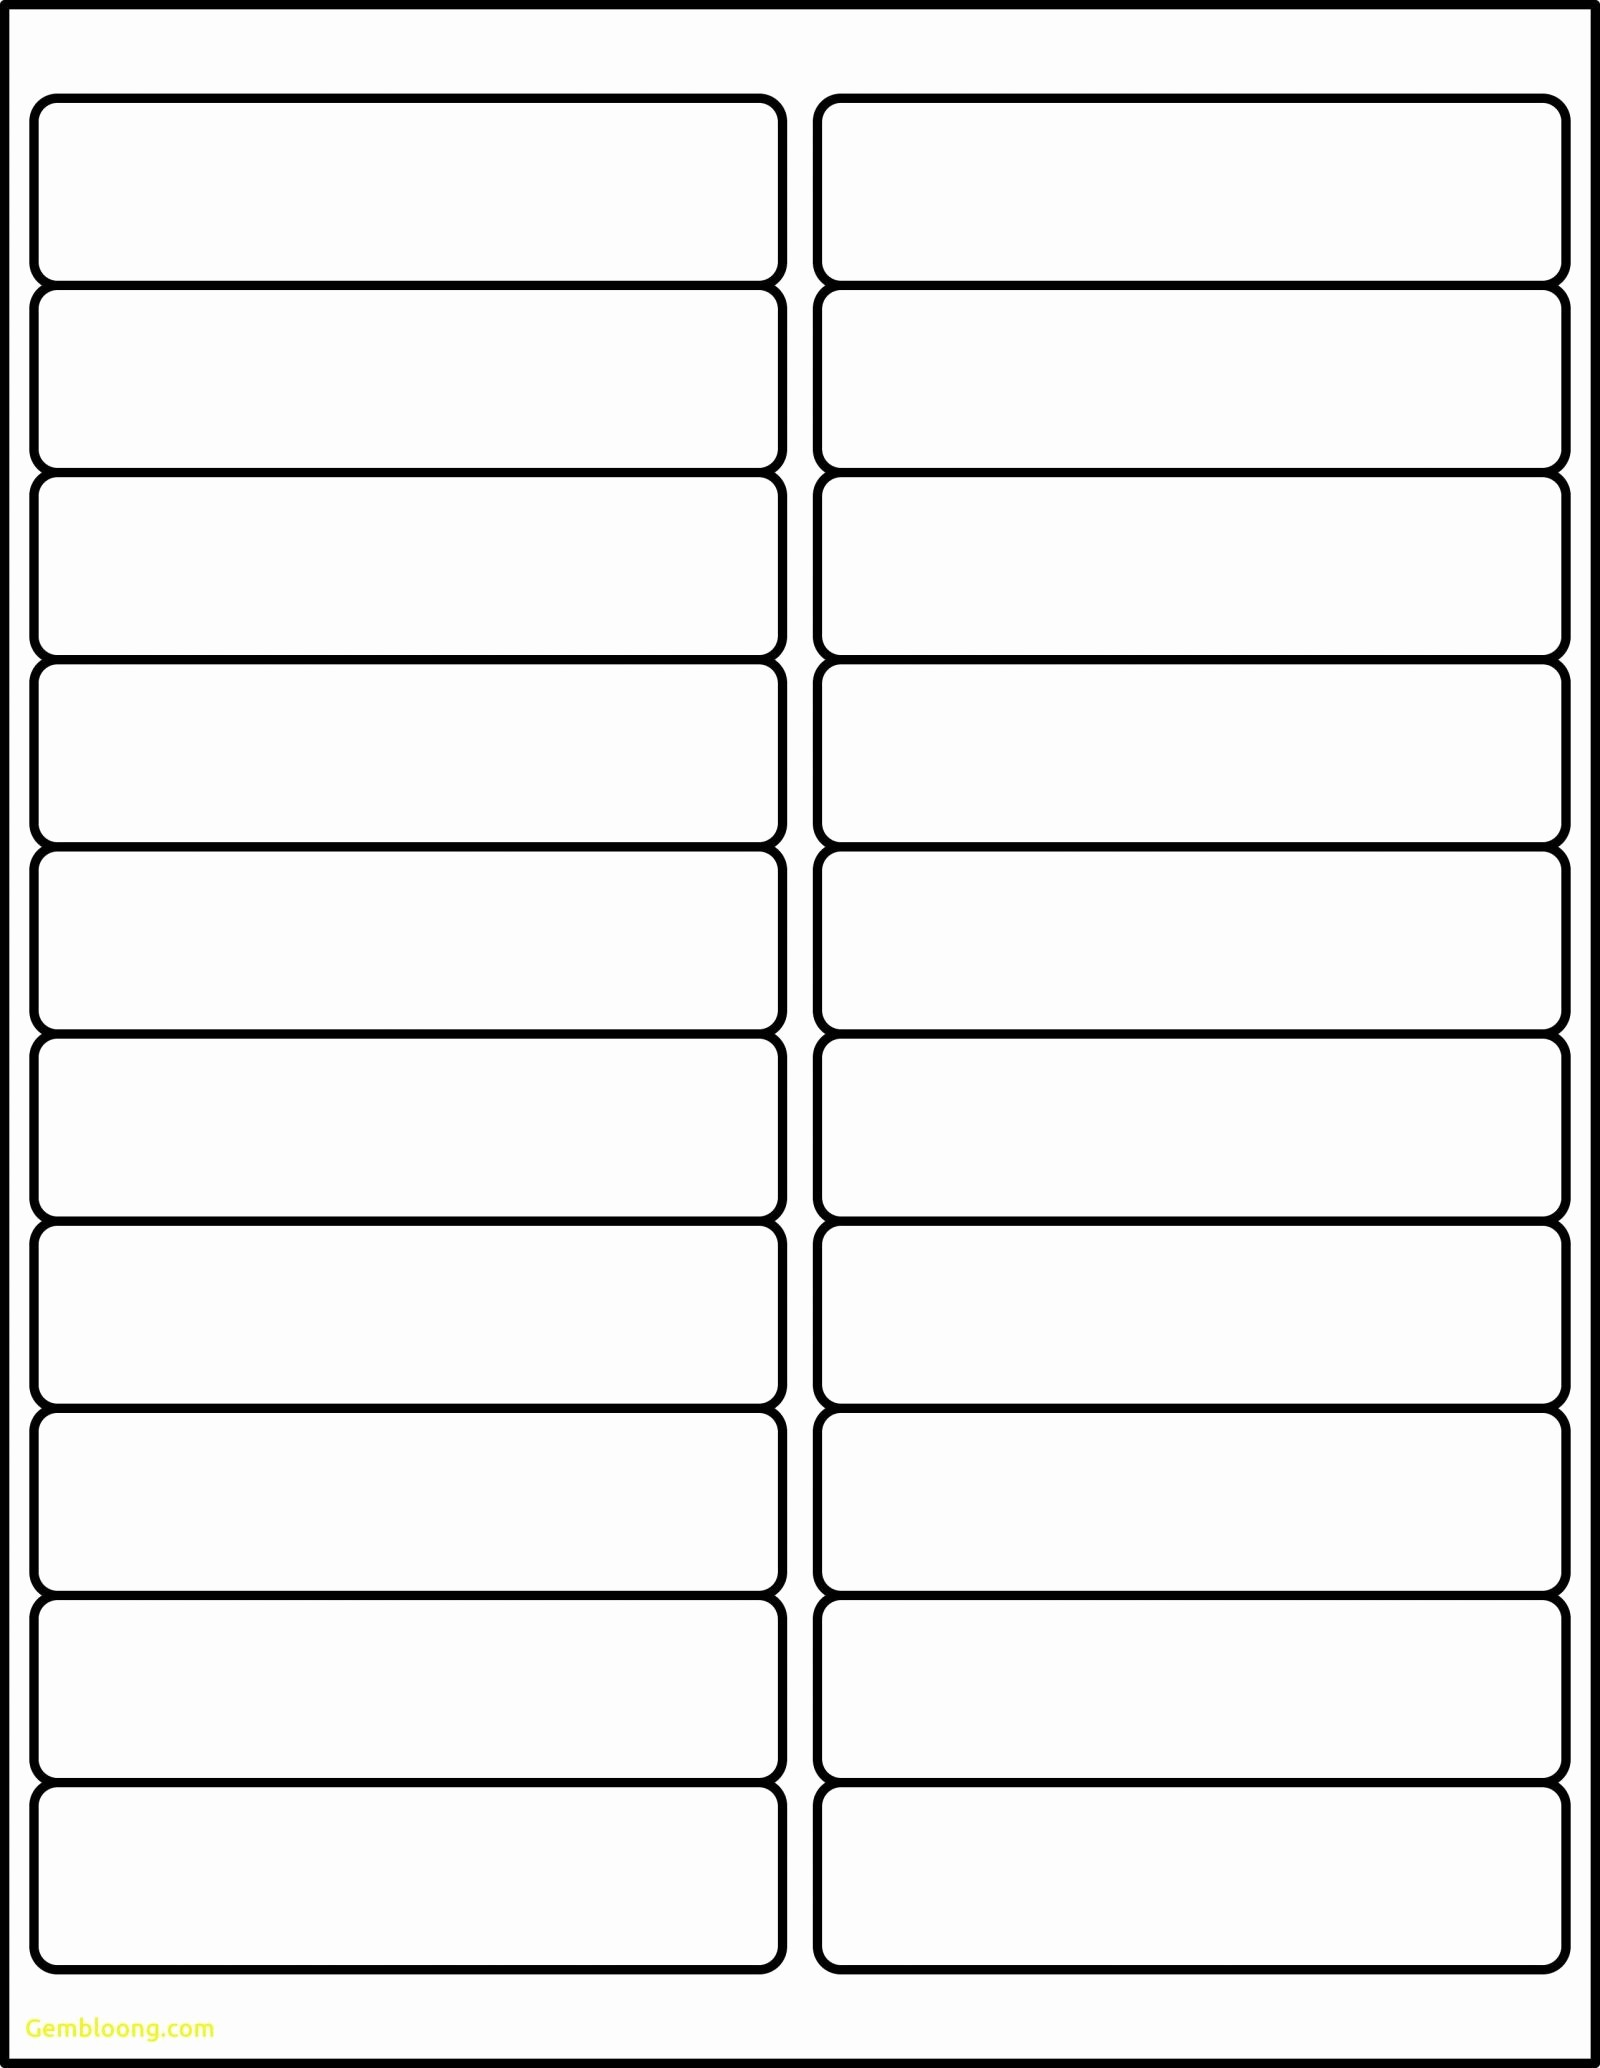 Avery Label 30 Per Sheet Elegant Labels Per Sheet Template Excel Avery Xerox Address